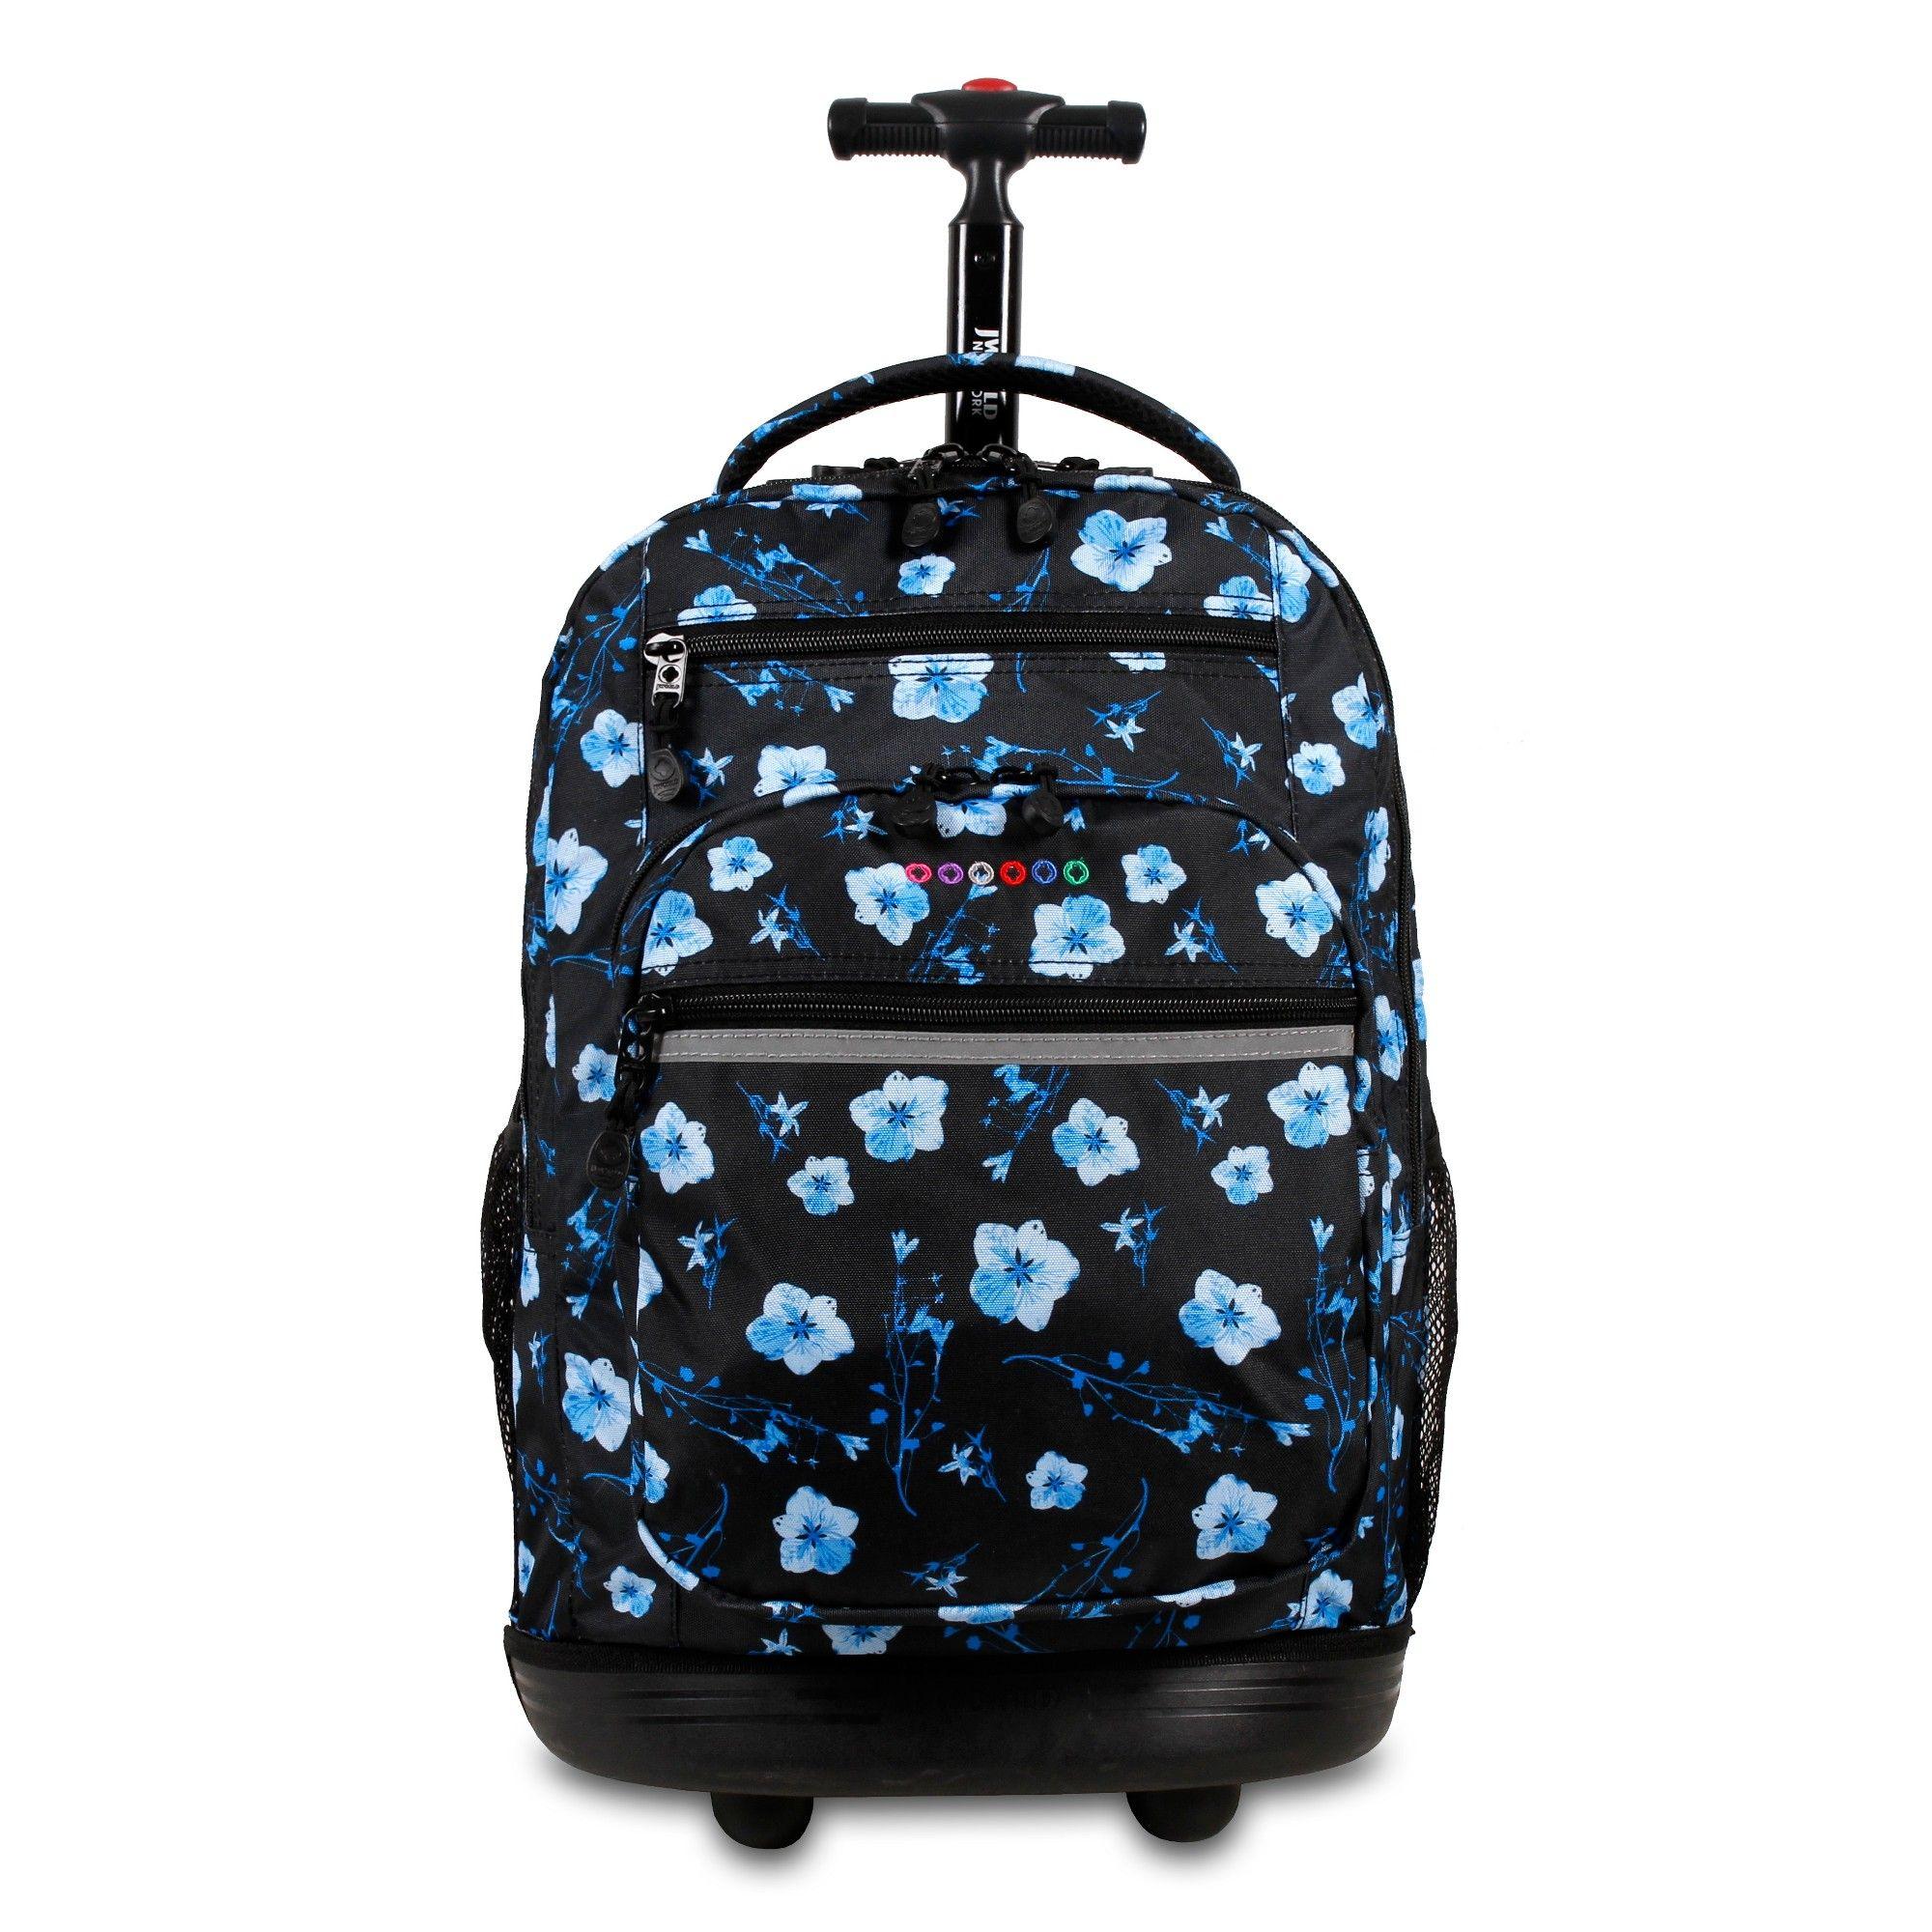 54c8bbf7a5b4 J World 20 Sundance Laptop Rolling Backpack - Night Bloom